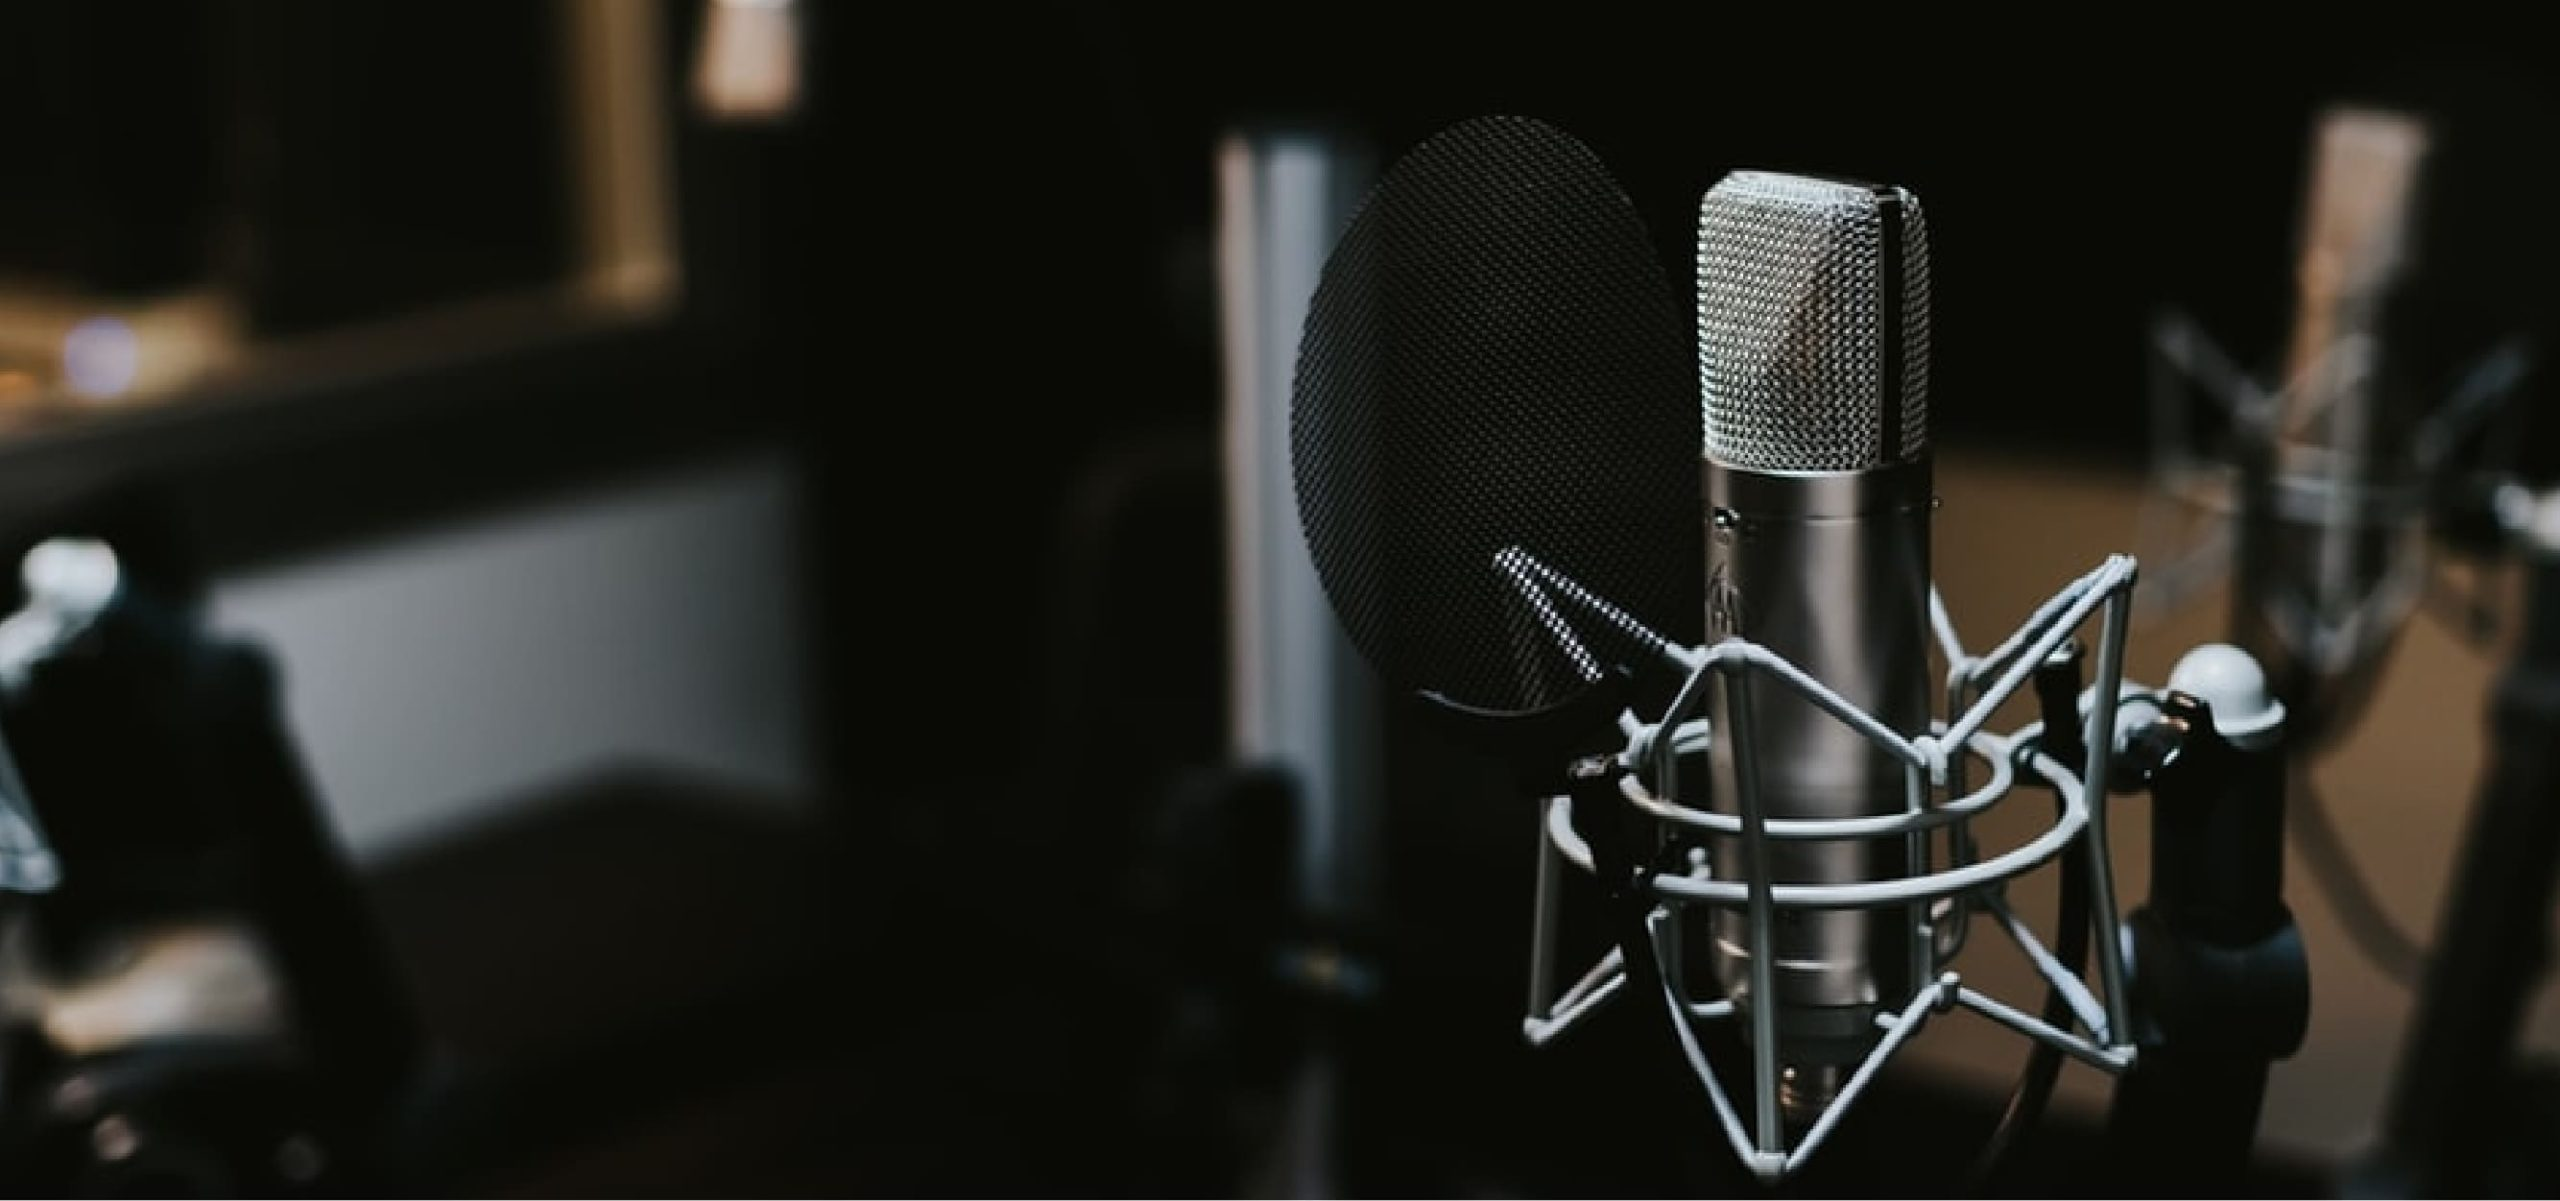 taiba vedio naat recording